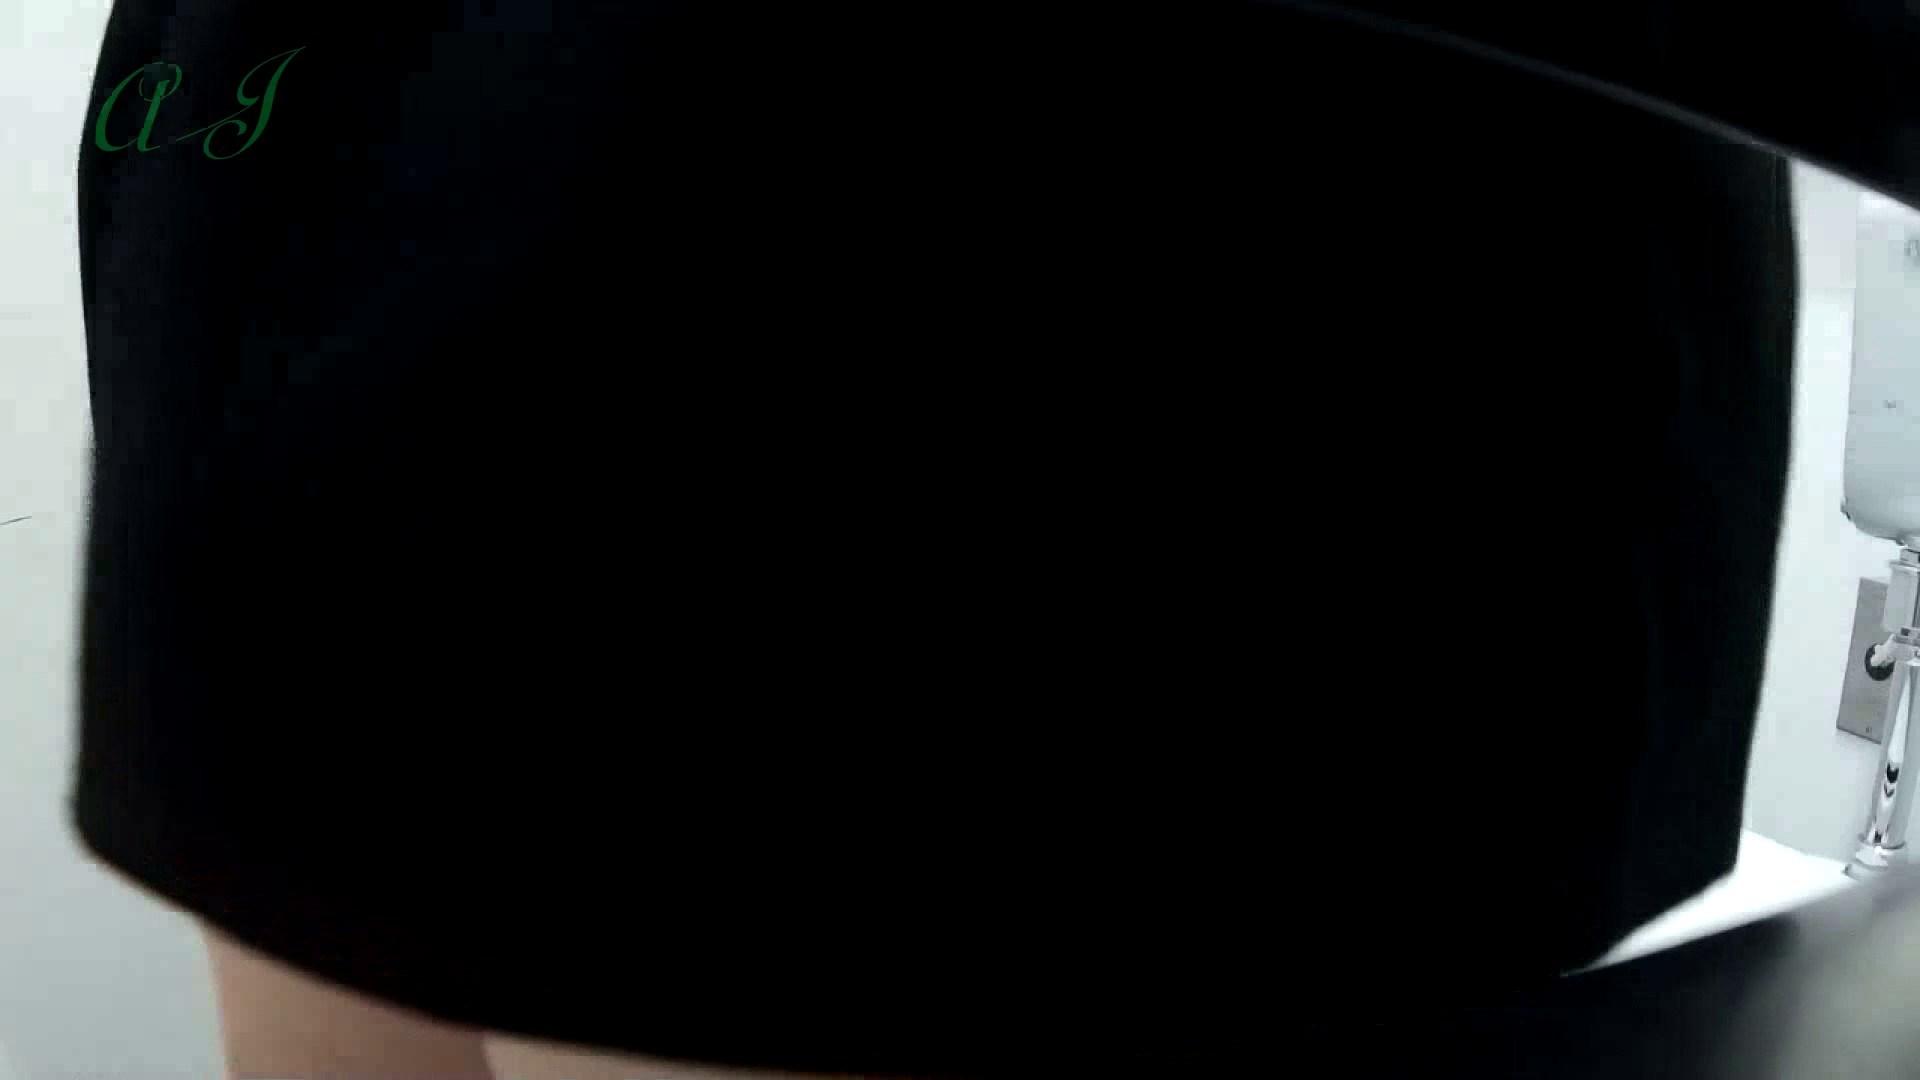 有名大学女性洗面所 vol.67トイレの女神さま♪ 洗面所編 濡れ場動画紹介 89PIX 22